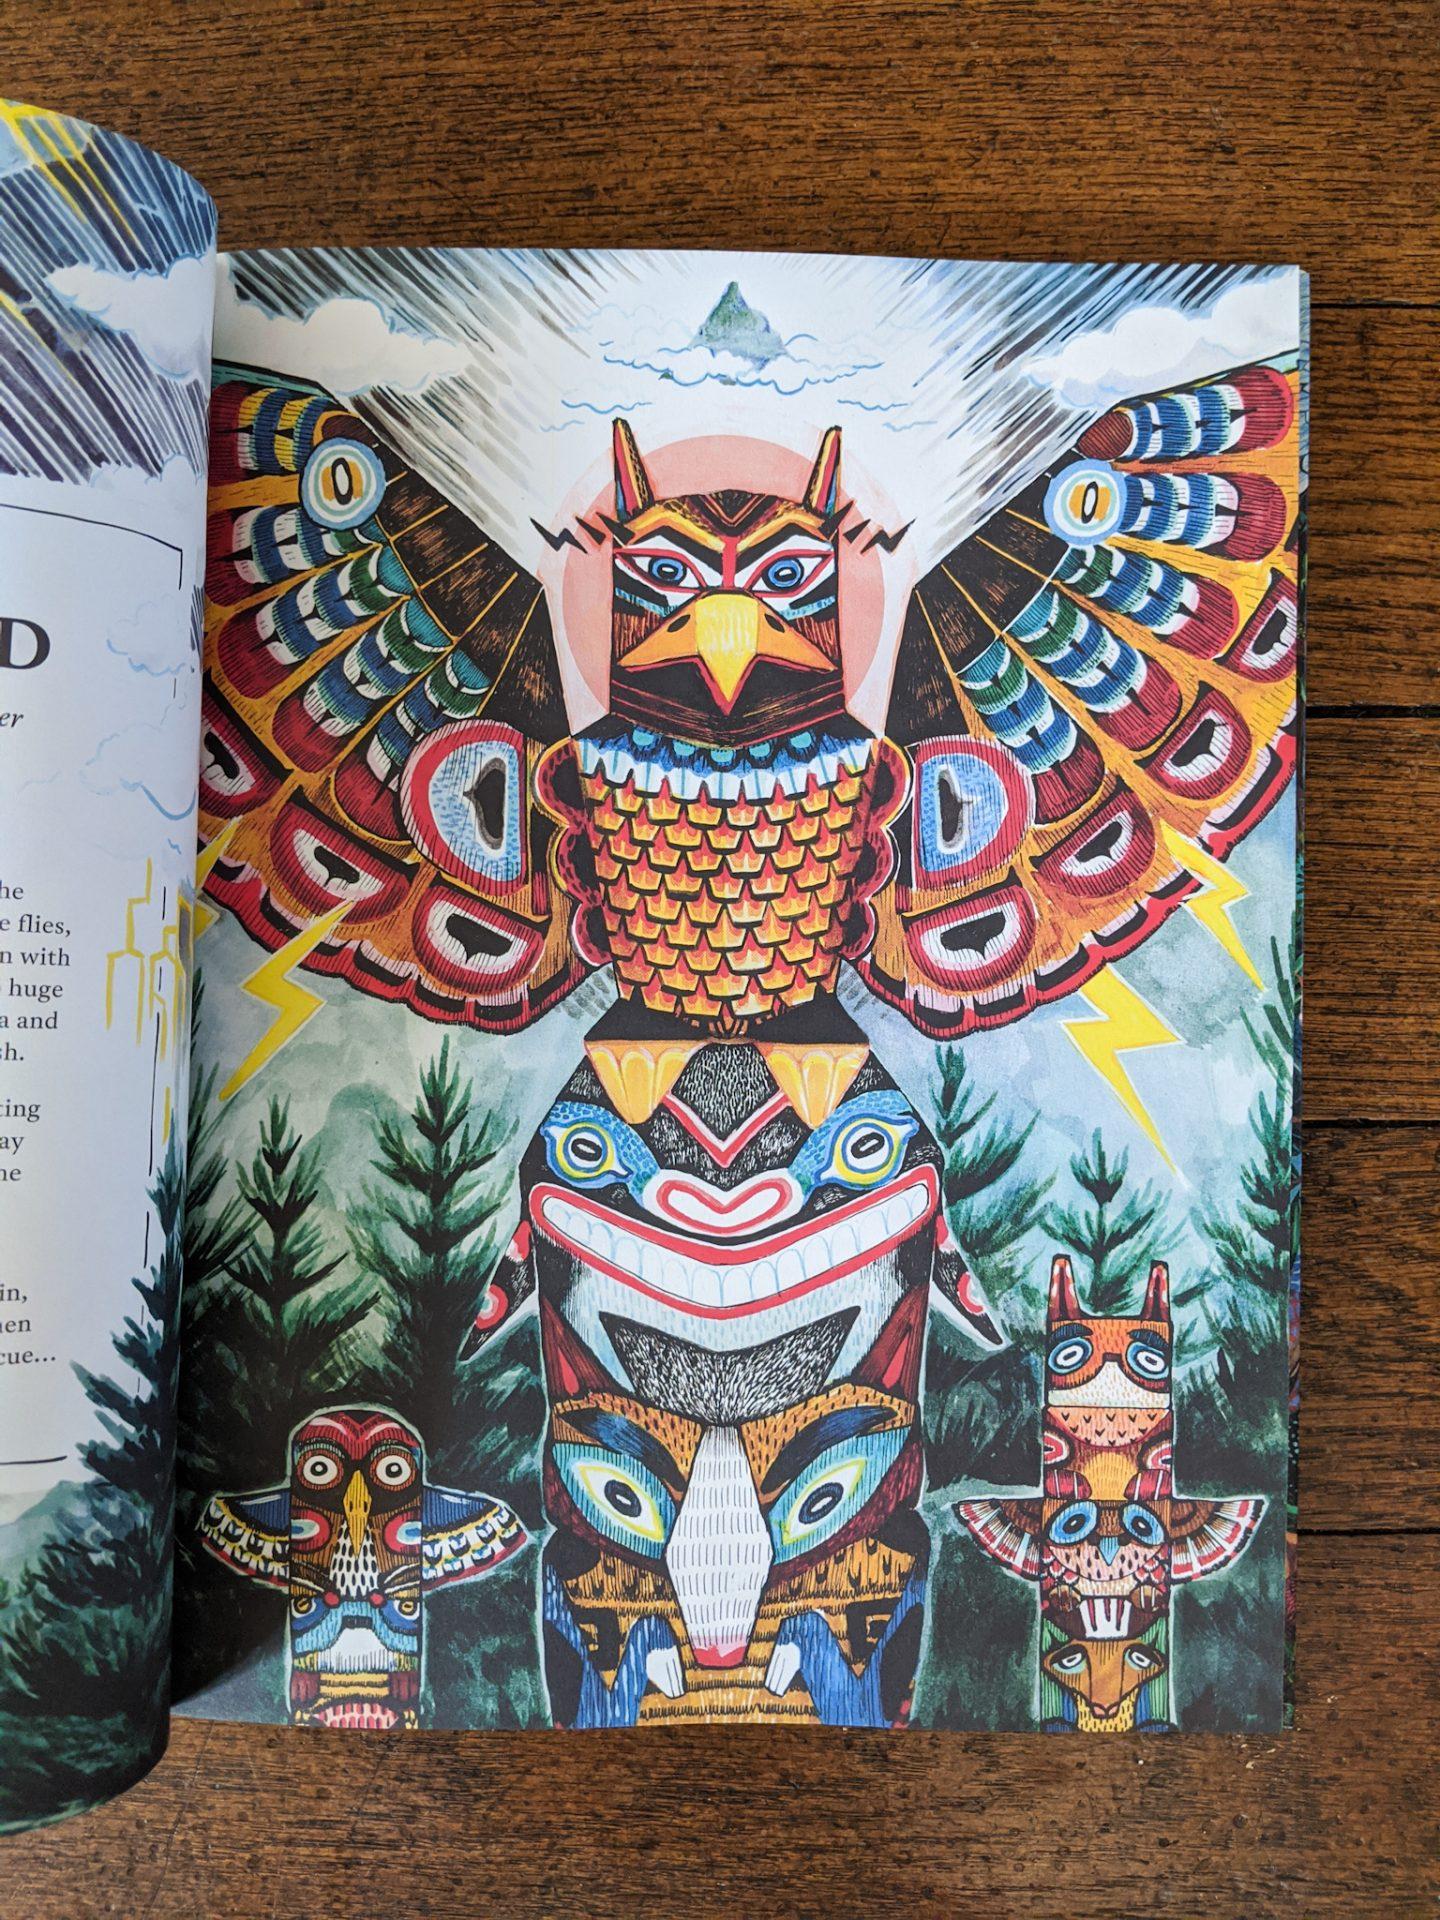 An illustration of a Thunderbird in Mythopedia